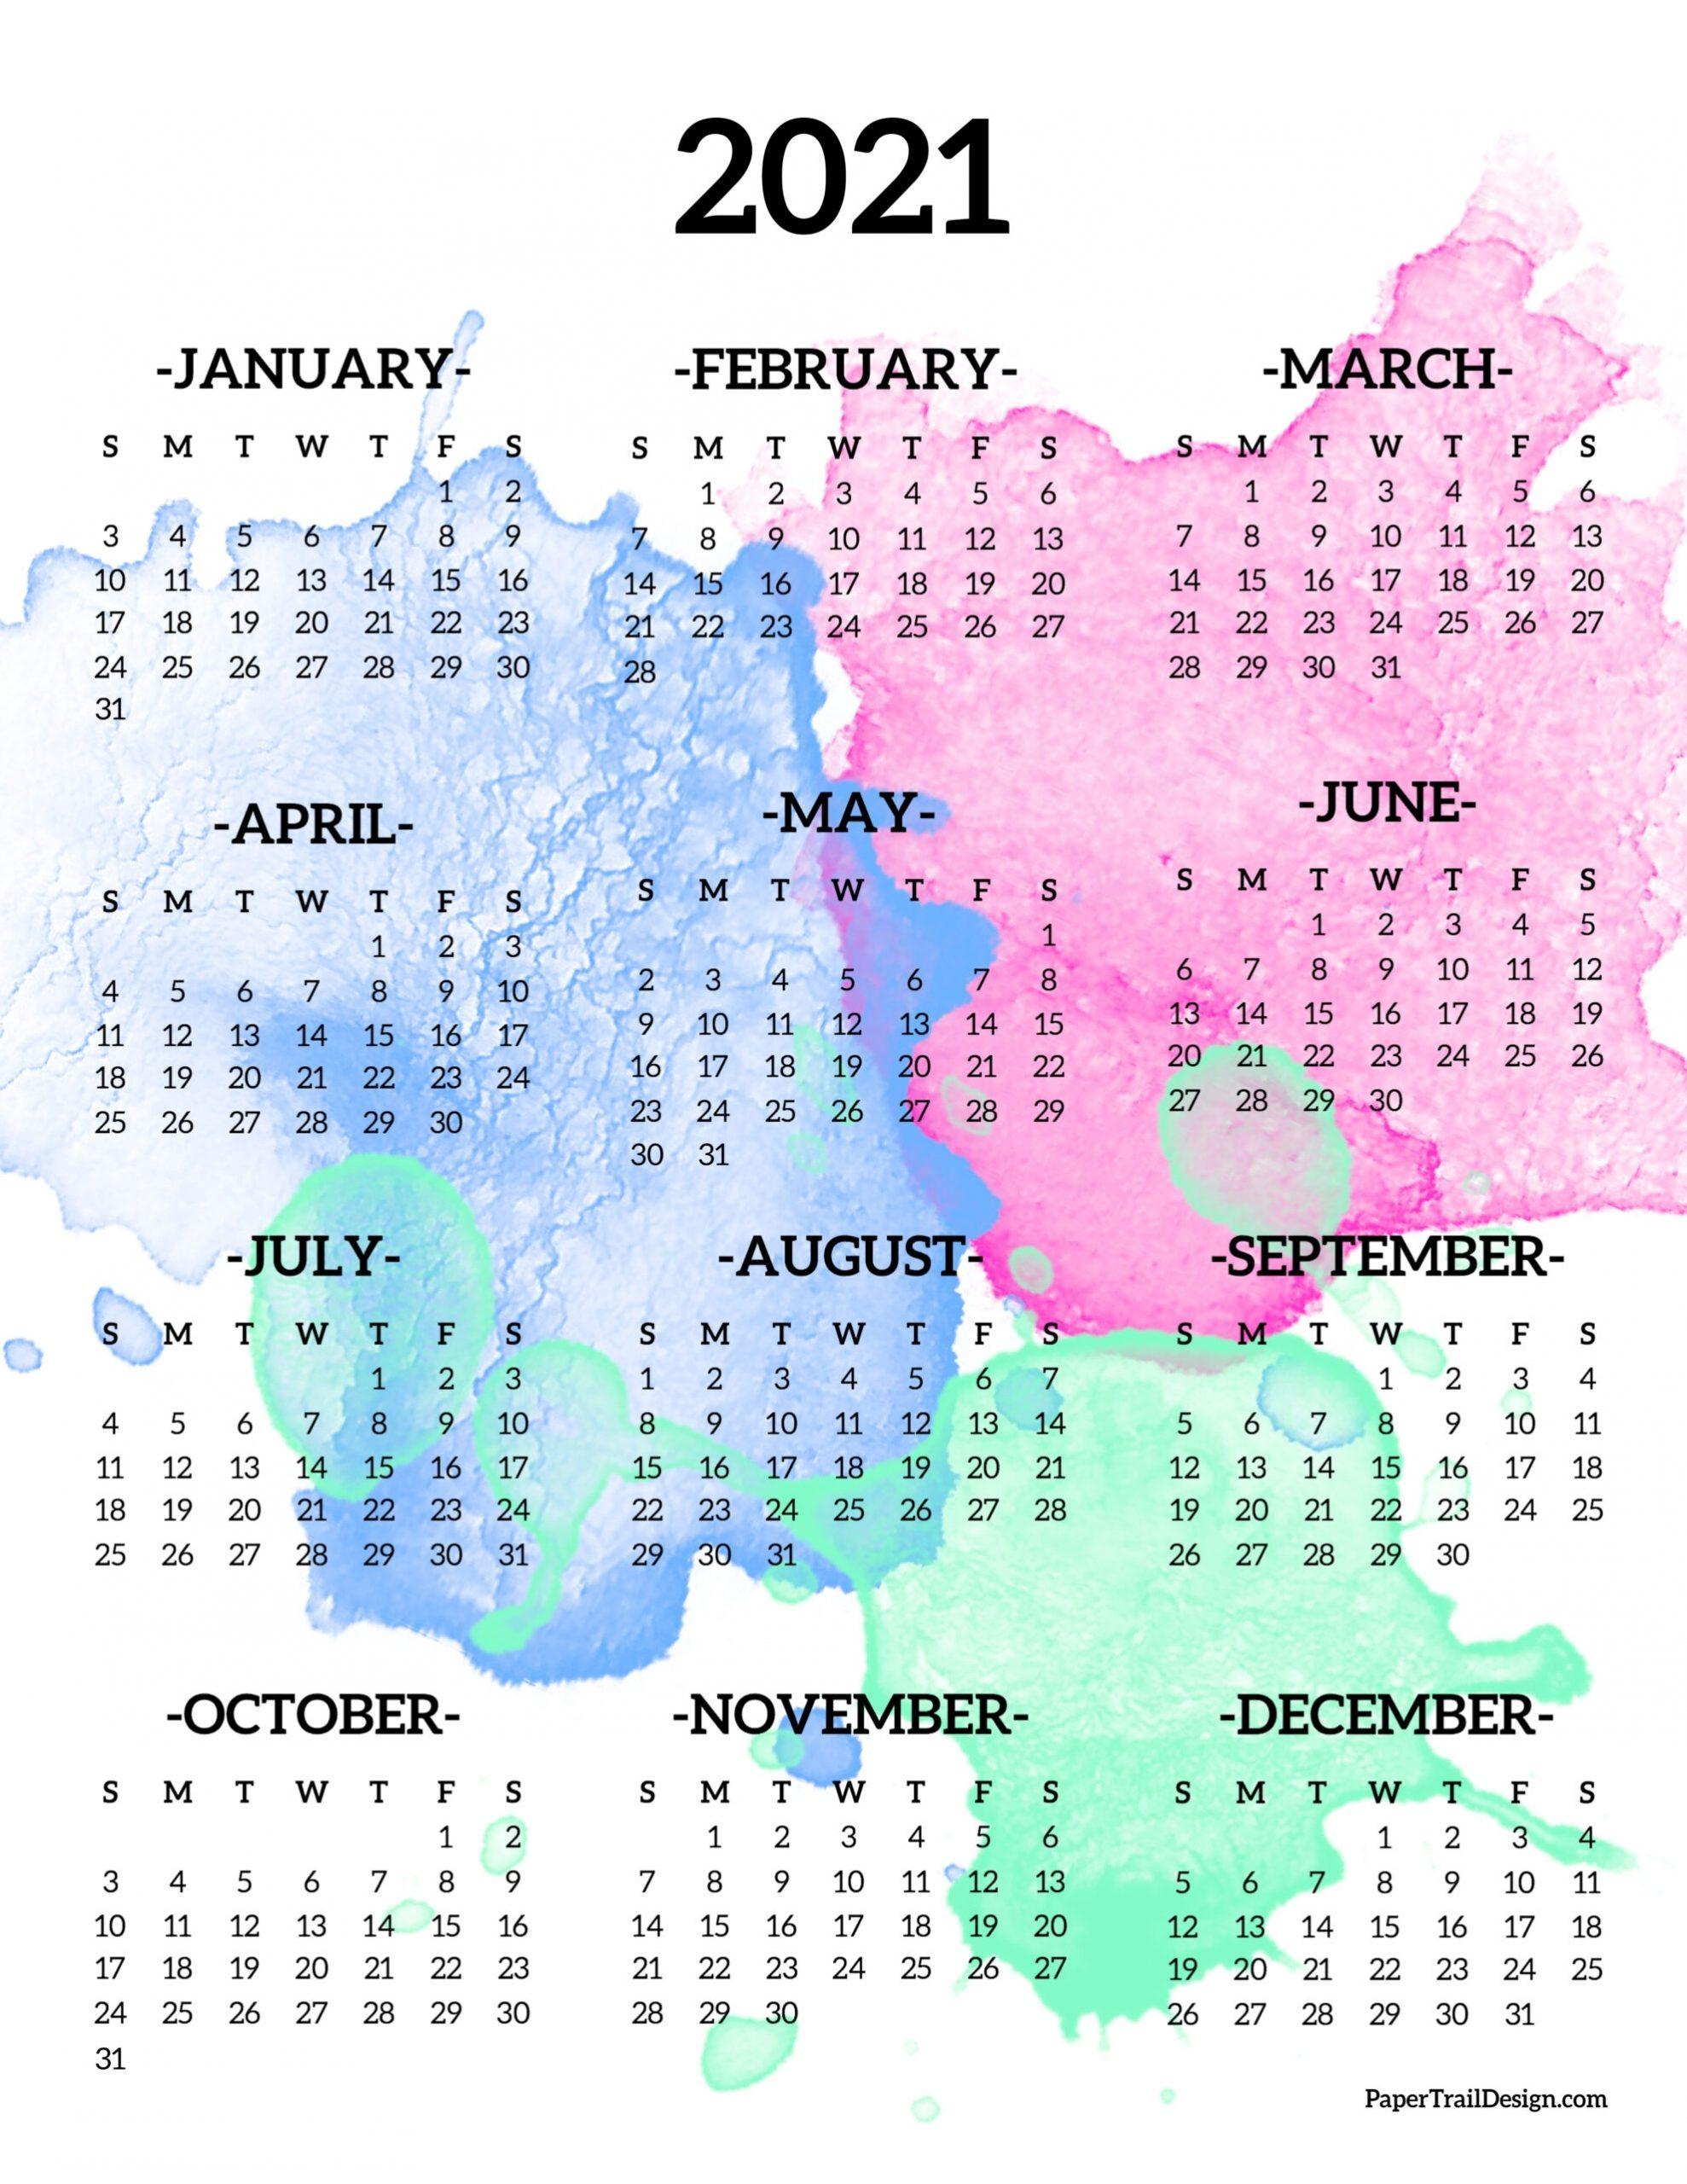 Get Free Month At A Glance 2021 Calendar